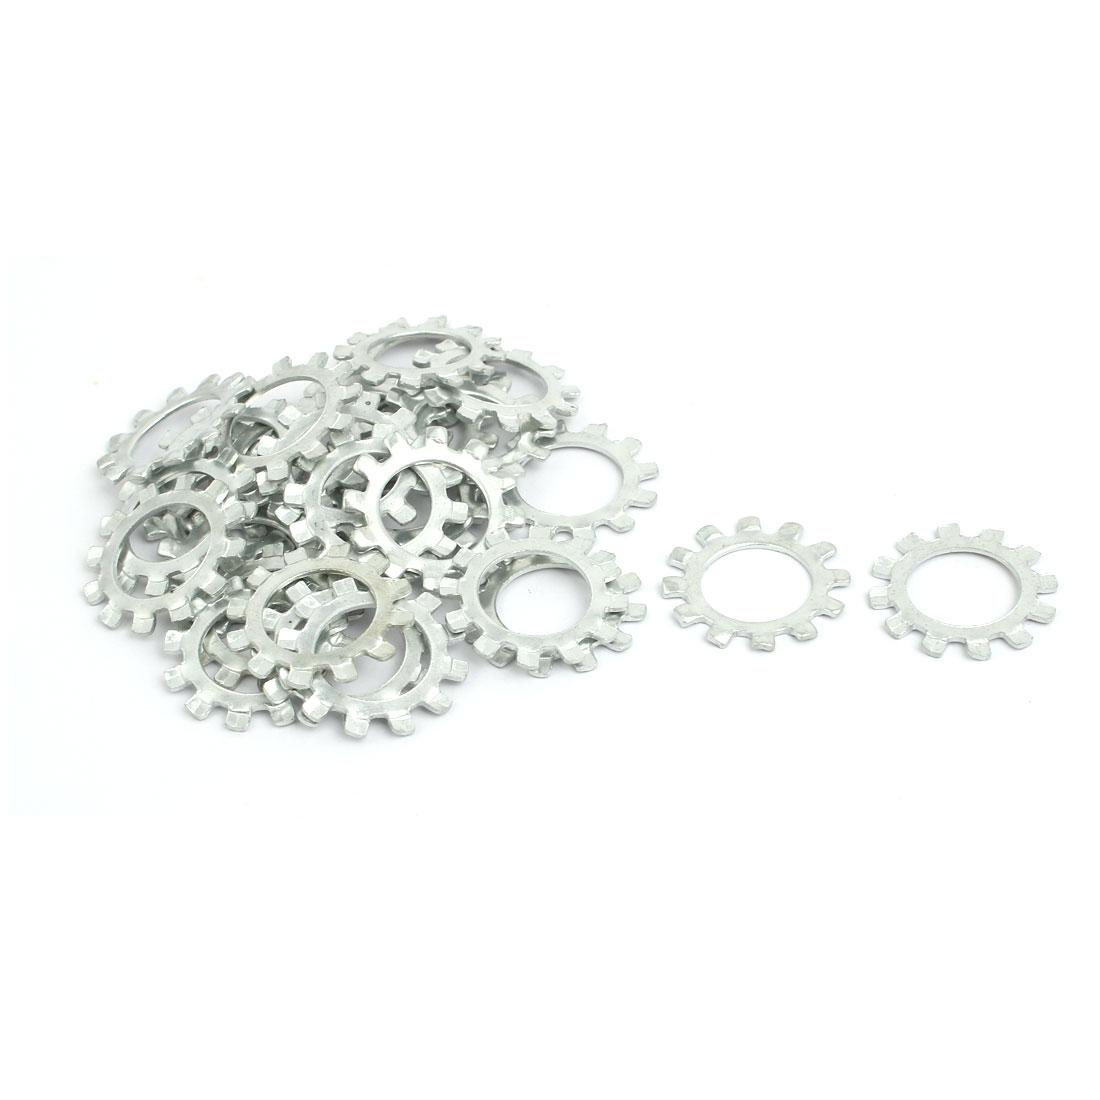 14mm Inner Diameter Carbon Steel Zinc Plated External Tooth Lock Washer 30pcs